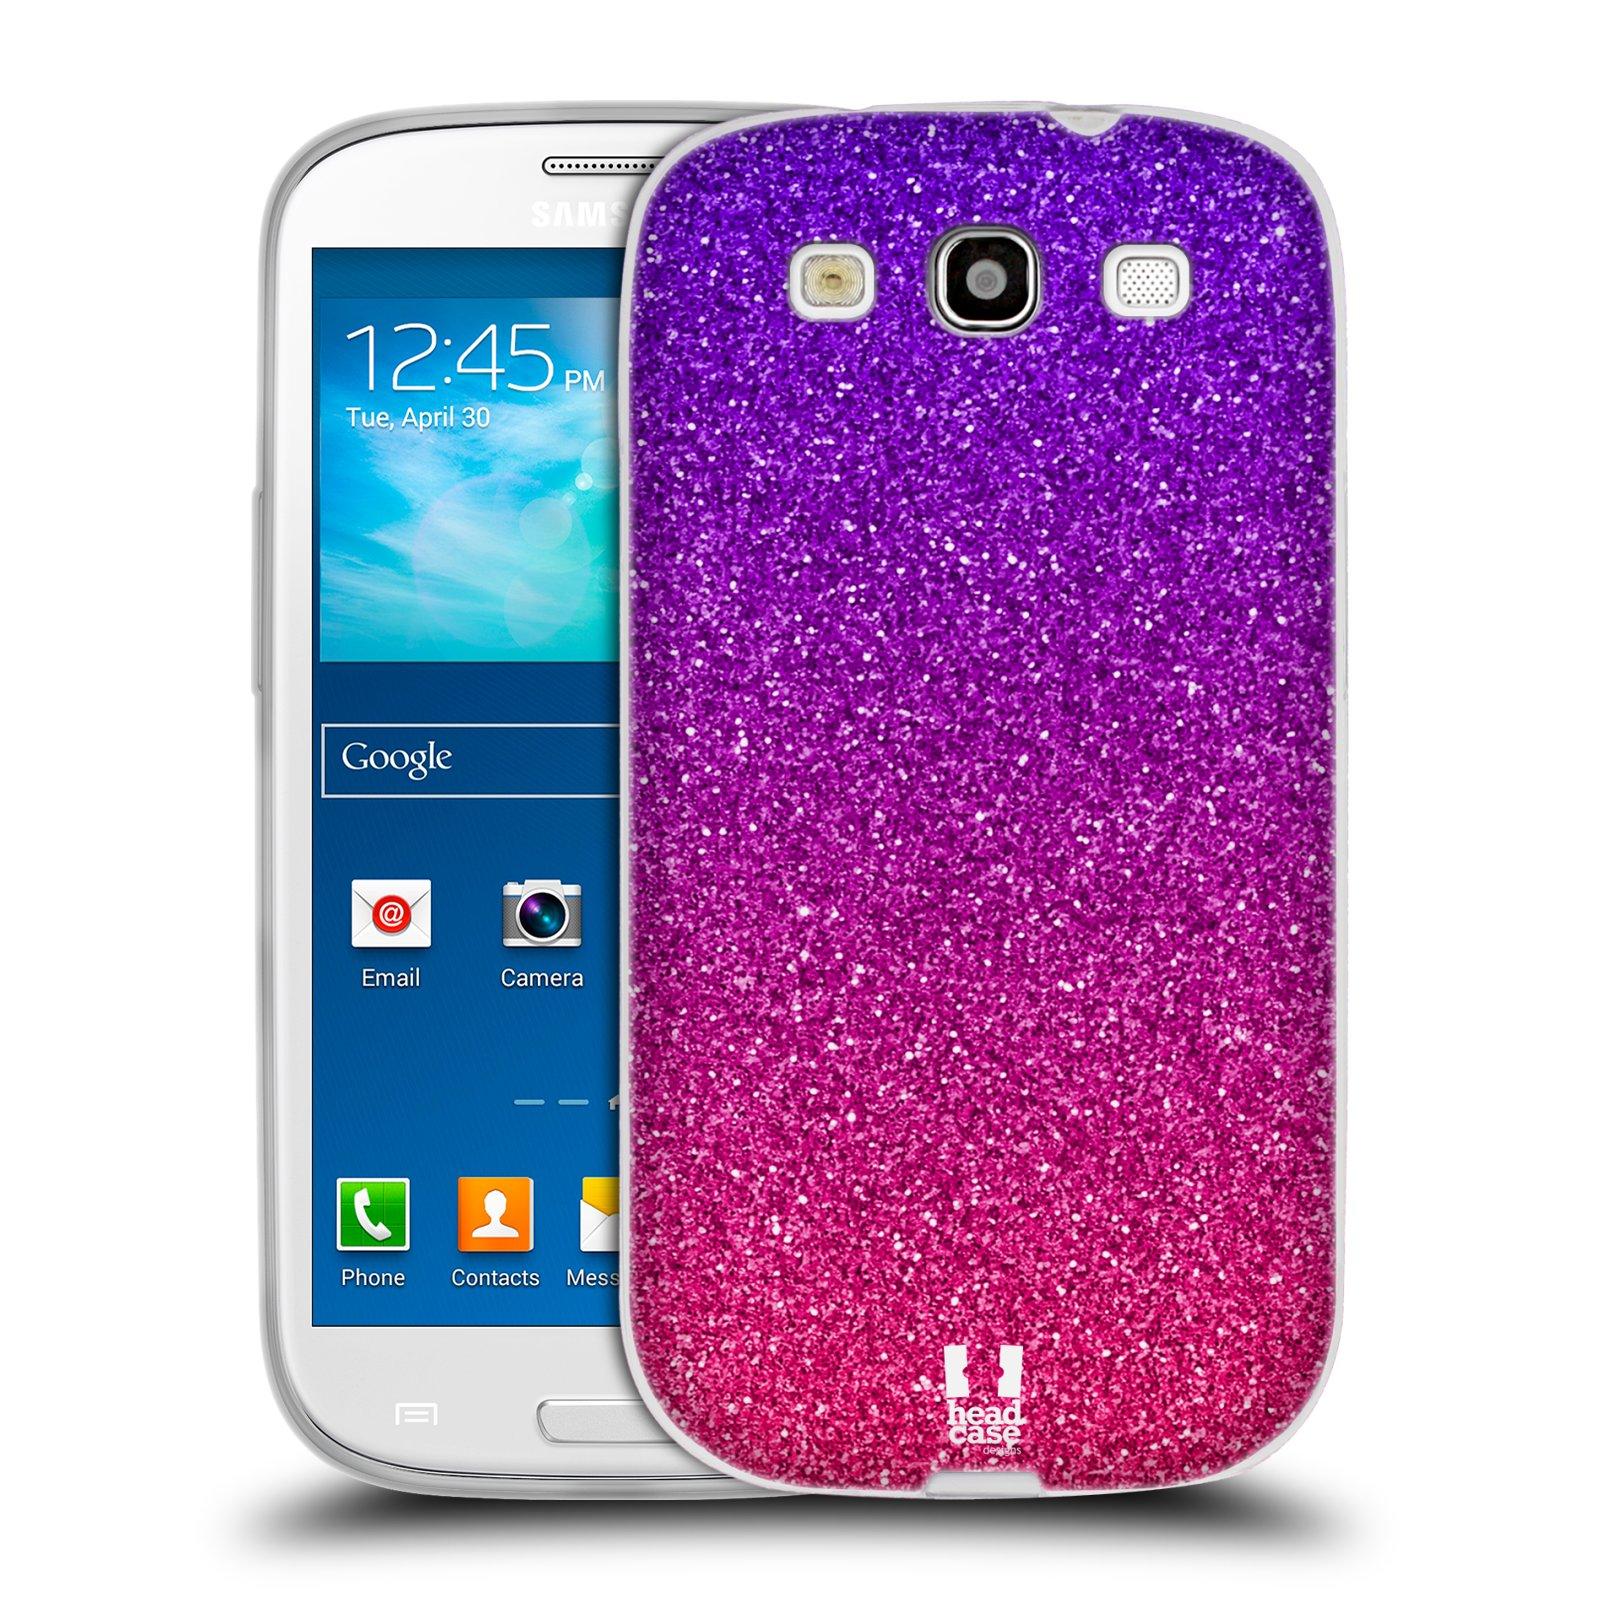 Silikonové pouzdro na mobil Samsung Galaxy S3 Neo HEAD CASE MIX PINK (Silikonový kryt či obal na mobilní telefon Samsung Galaxy S3 Neo GT-i9301i)